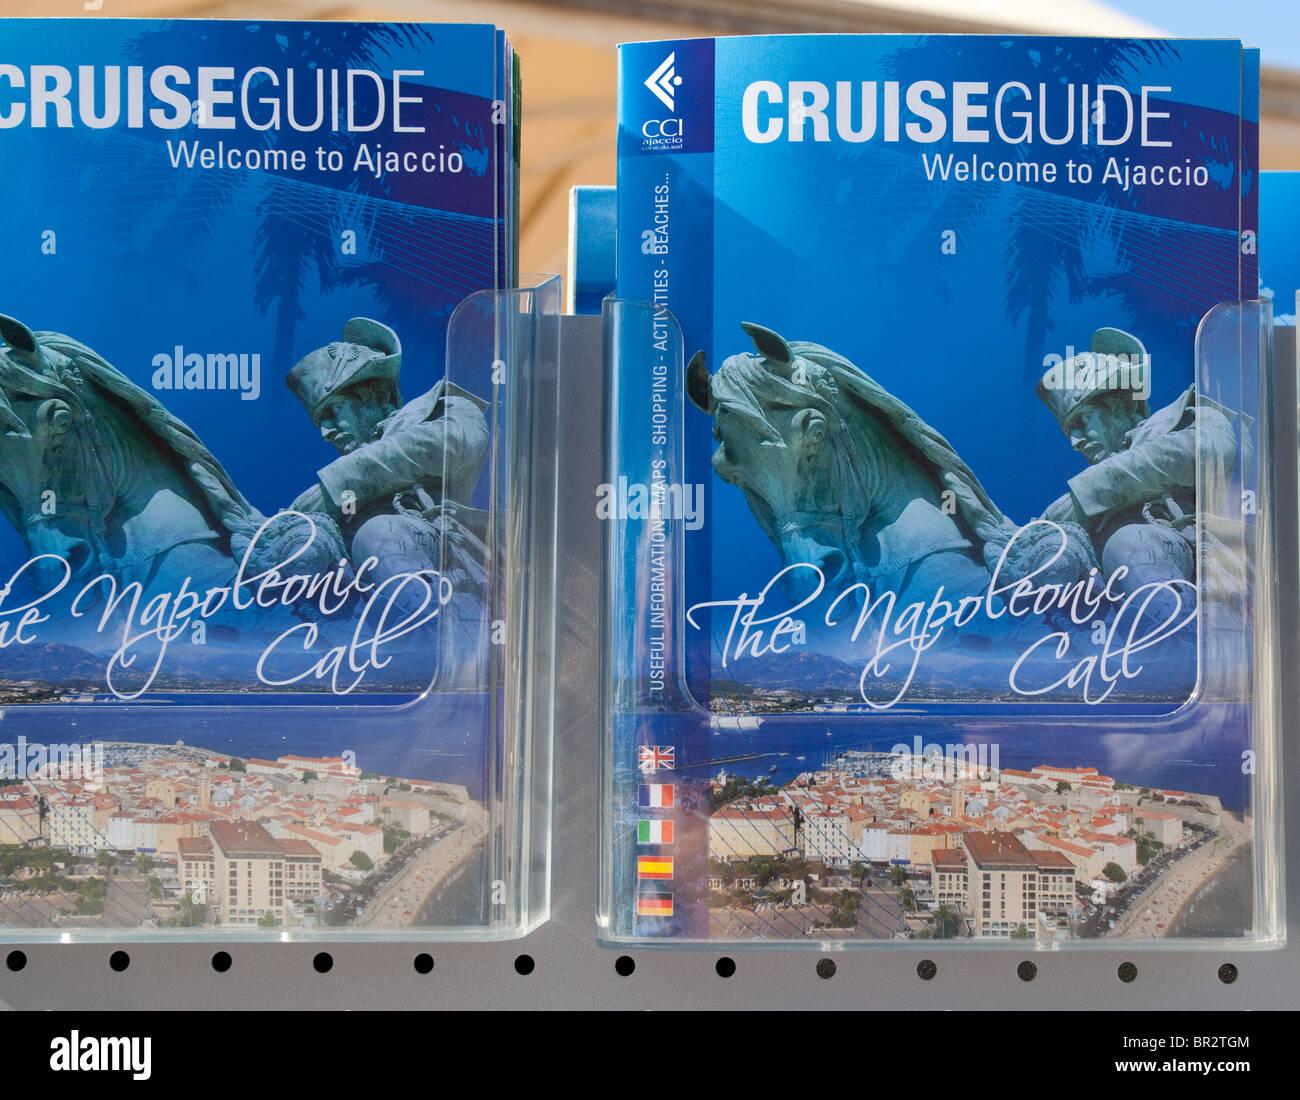 travel brochure for tourists Ajaccio Corsica - Stock Image